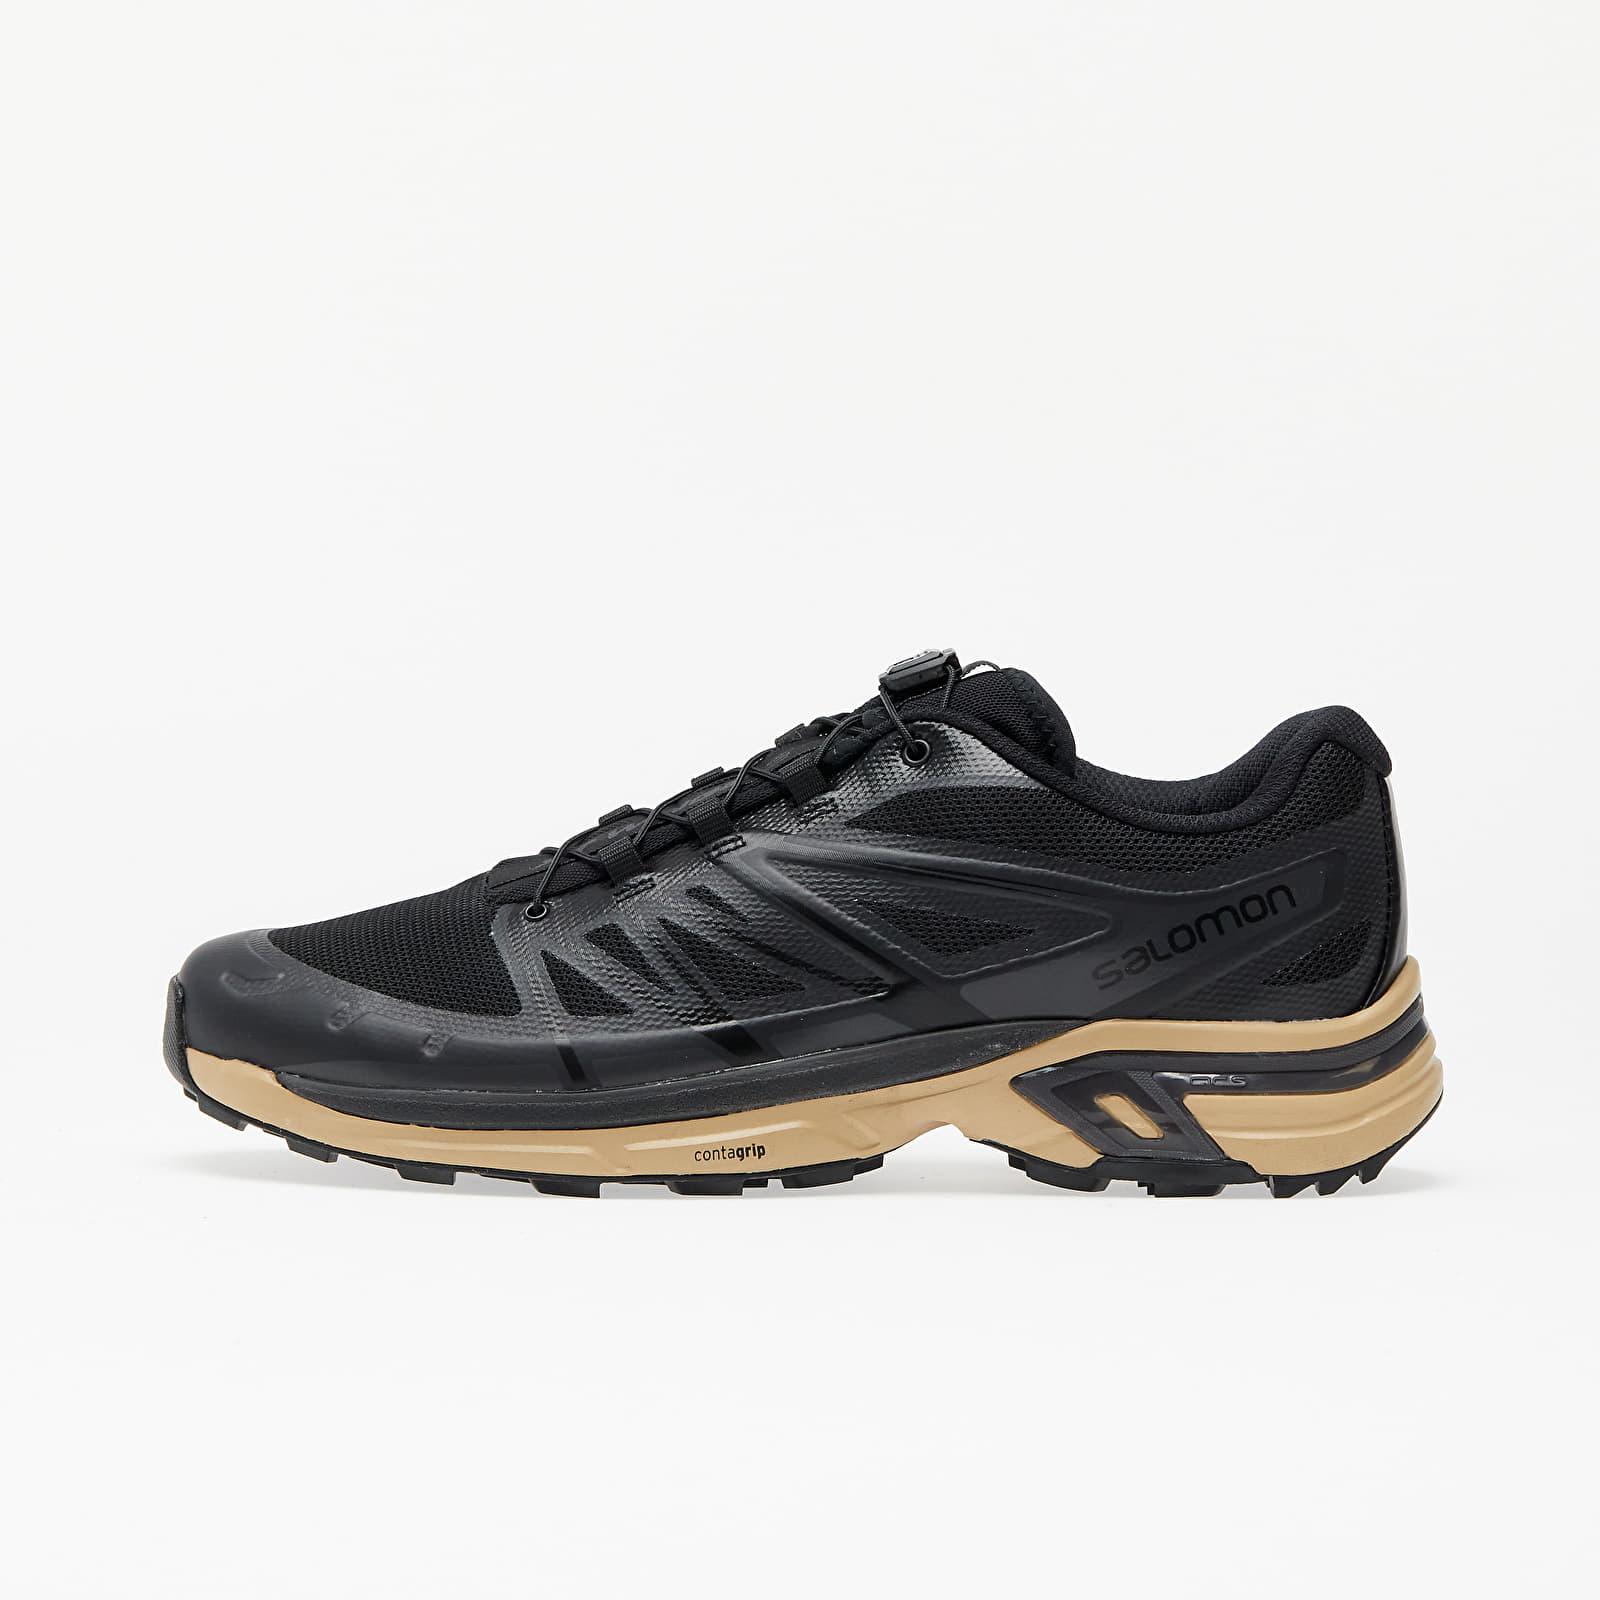 Men's shoes Salomon XT-Wings 2 Advanced Black/ Safari/ Magnet